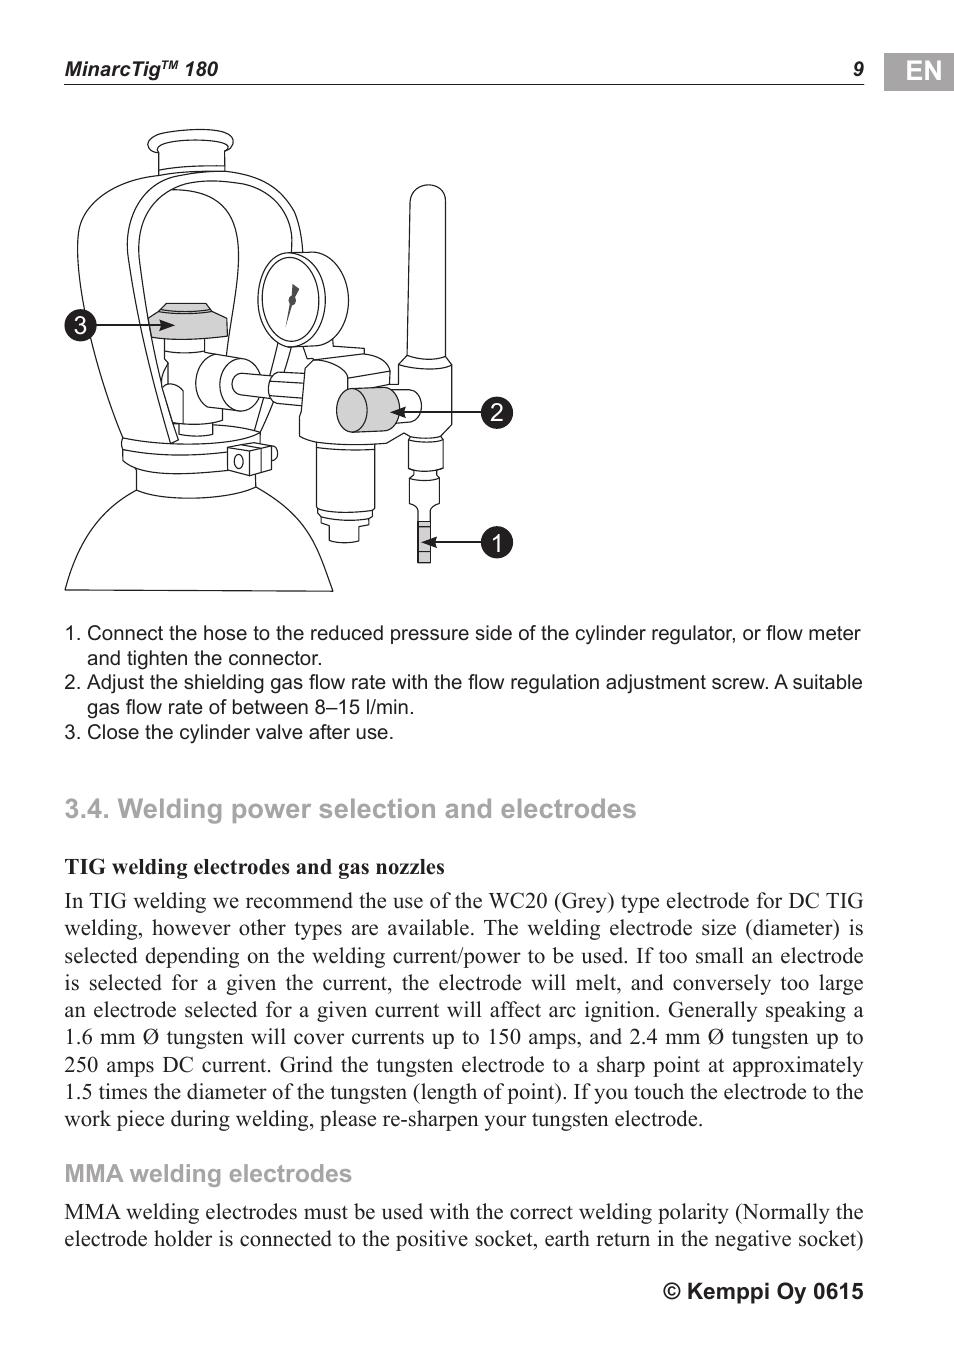 Welding Power Selection And Electrodes Kemppi Minarctig 180 User Electrode Diagram Manual Page 10 18